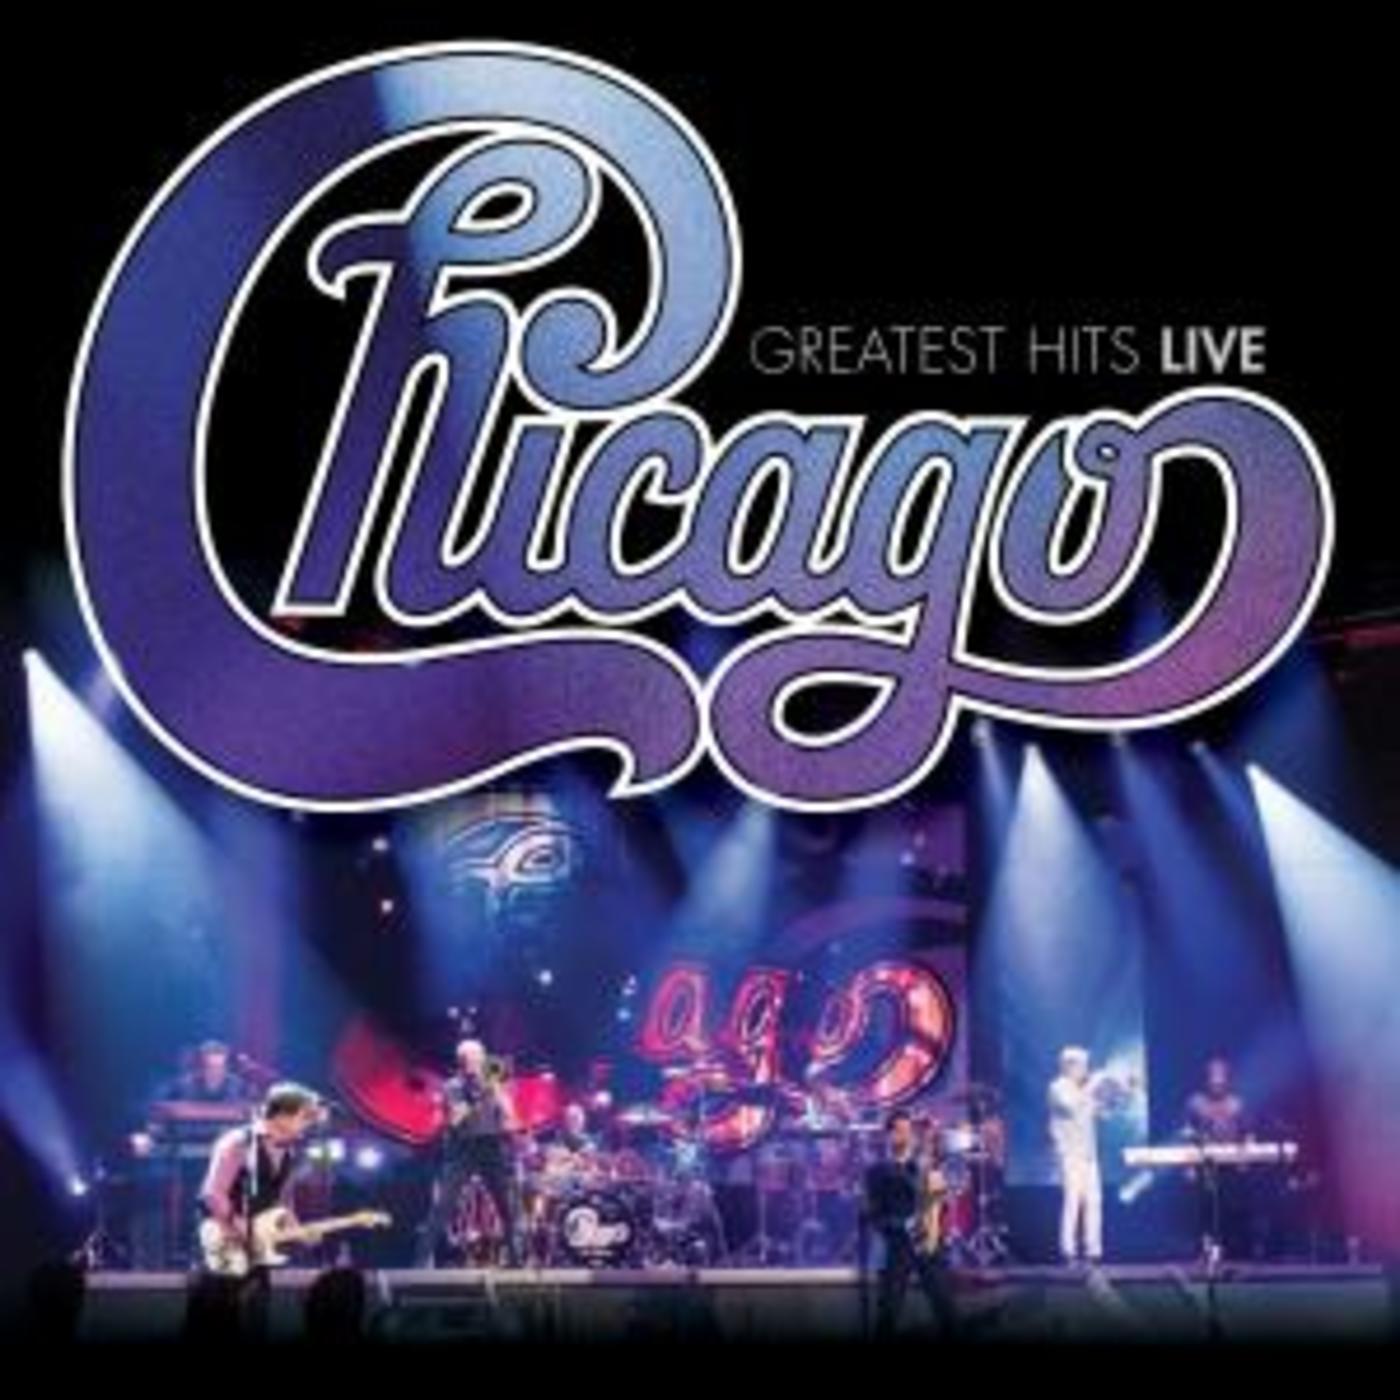 chicago greatest hits live rhino